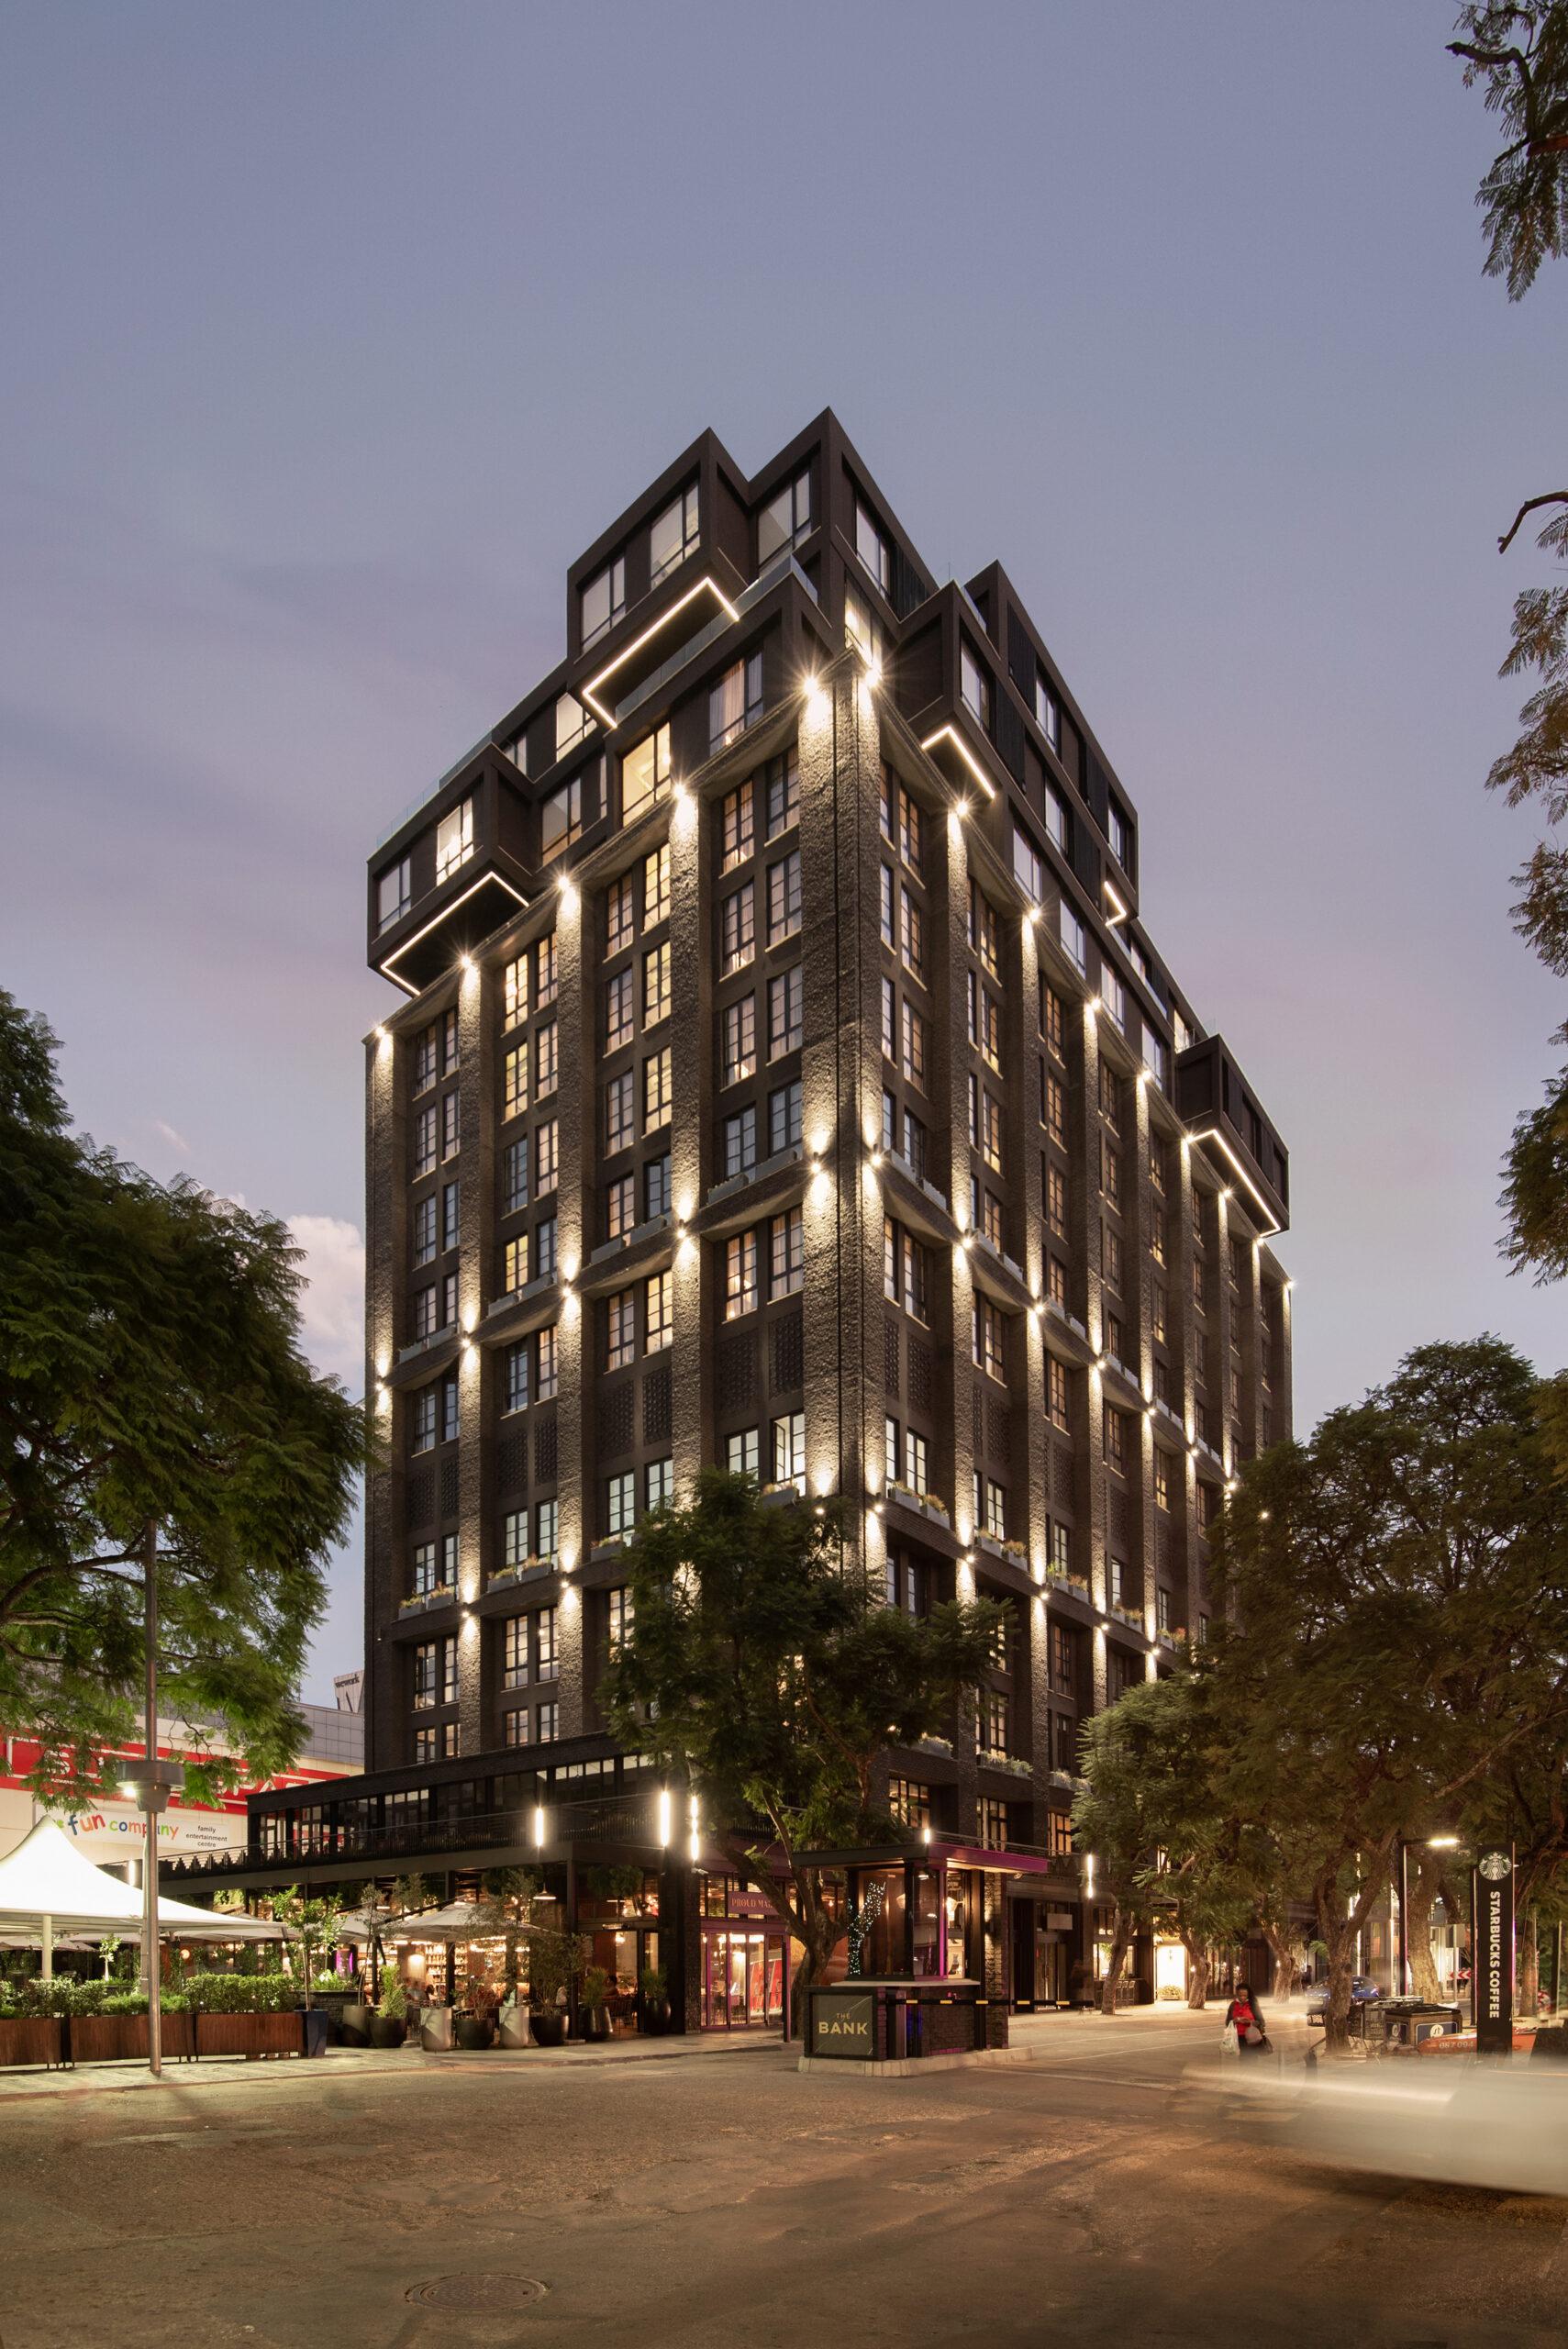 imbewu-design-the-bank-hotel-exterior-4